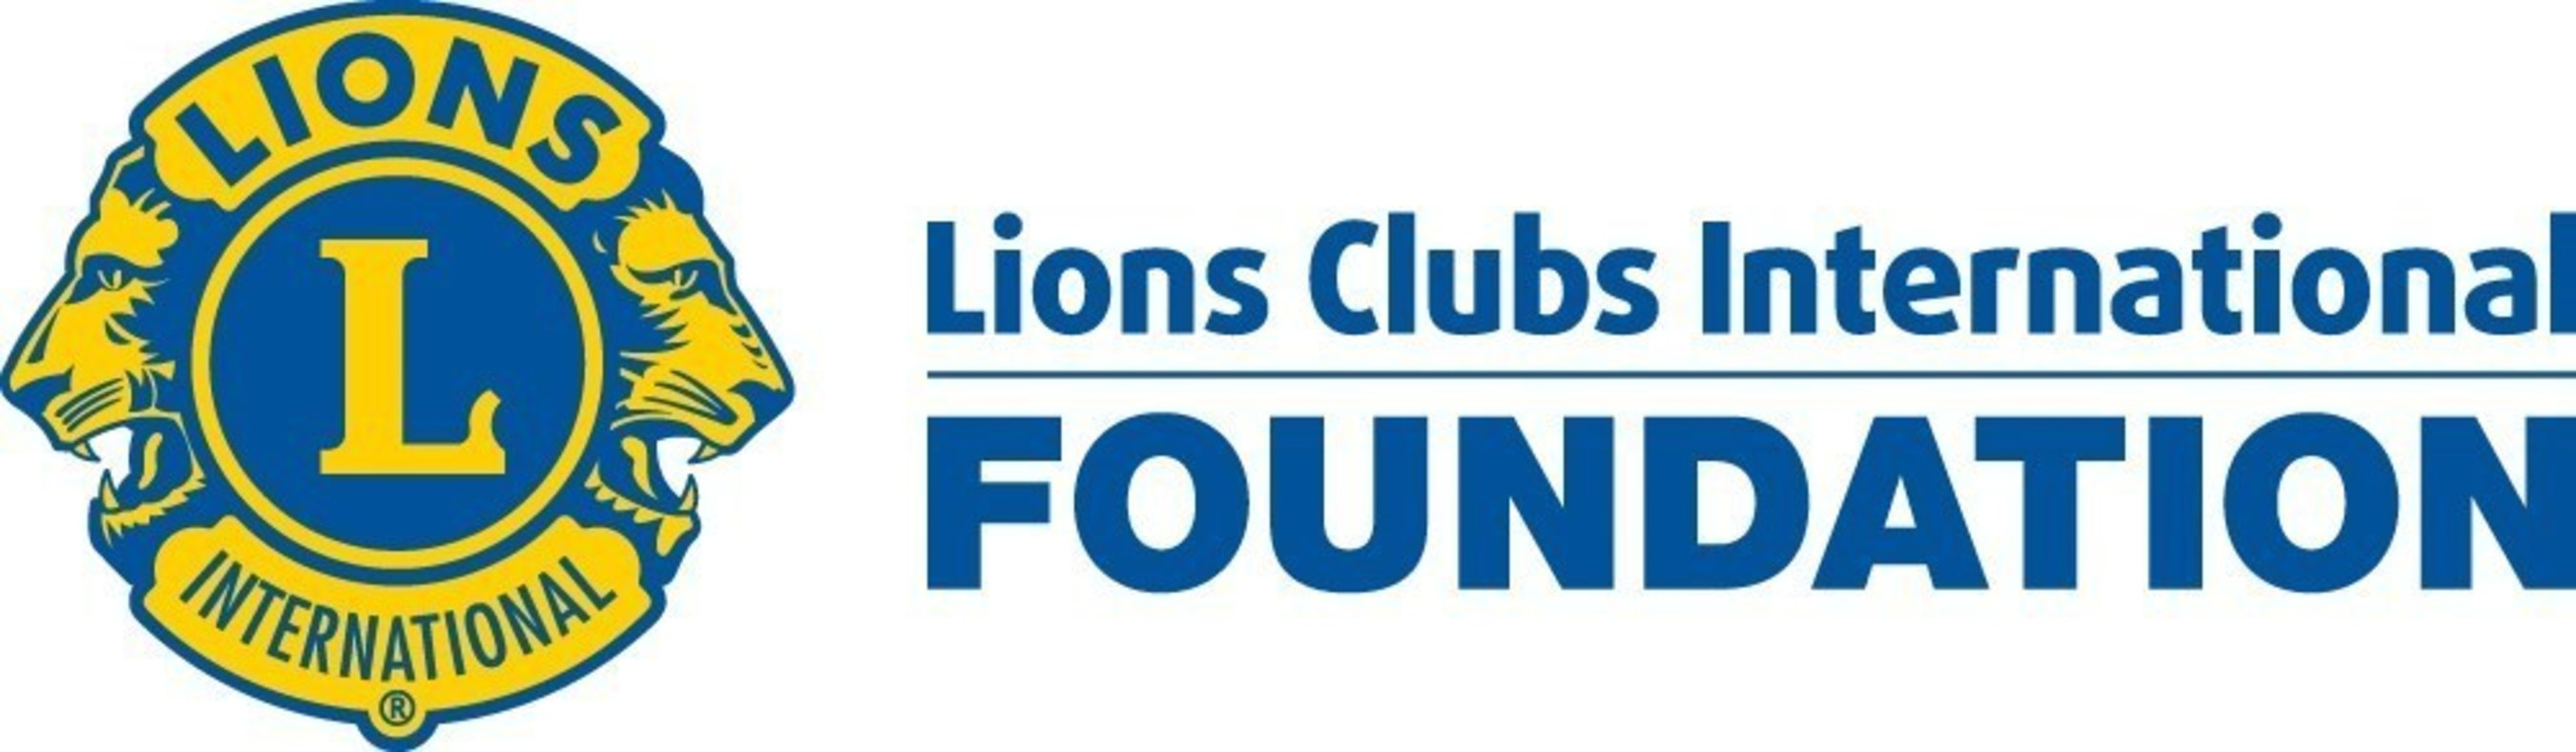 Lions Clubs International Foundation logo